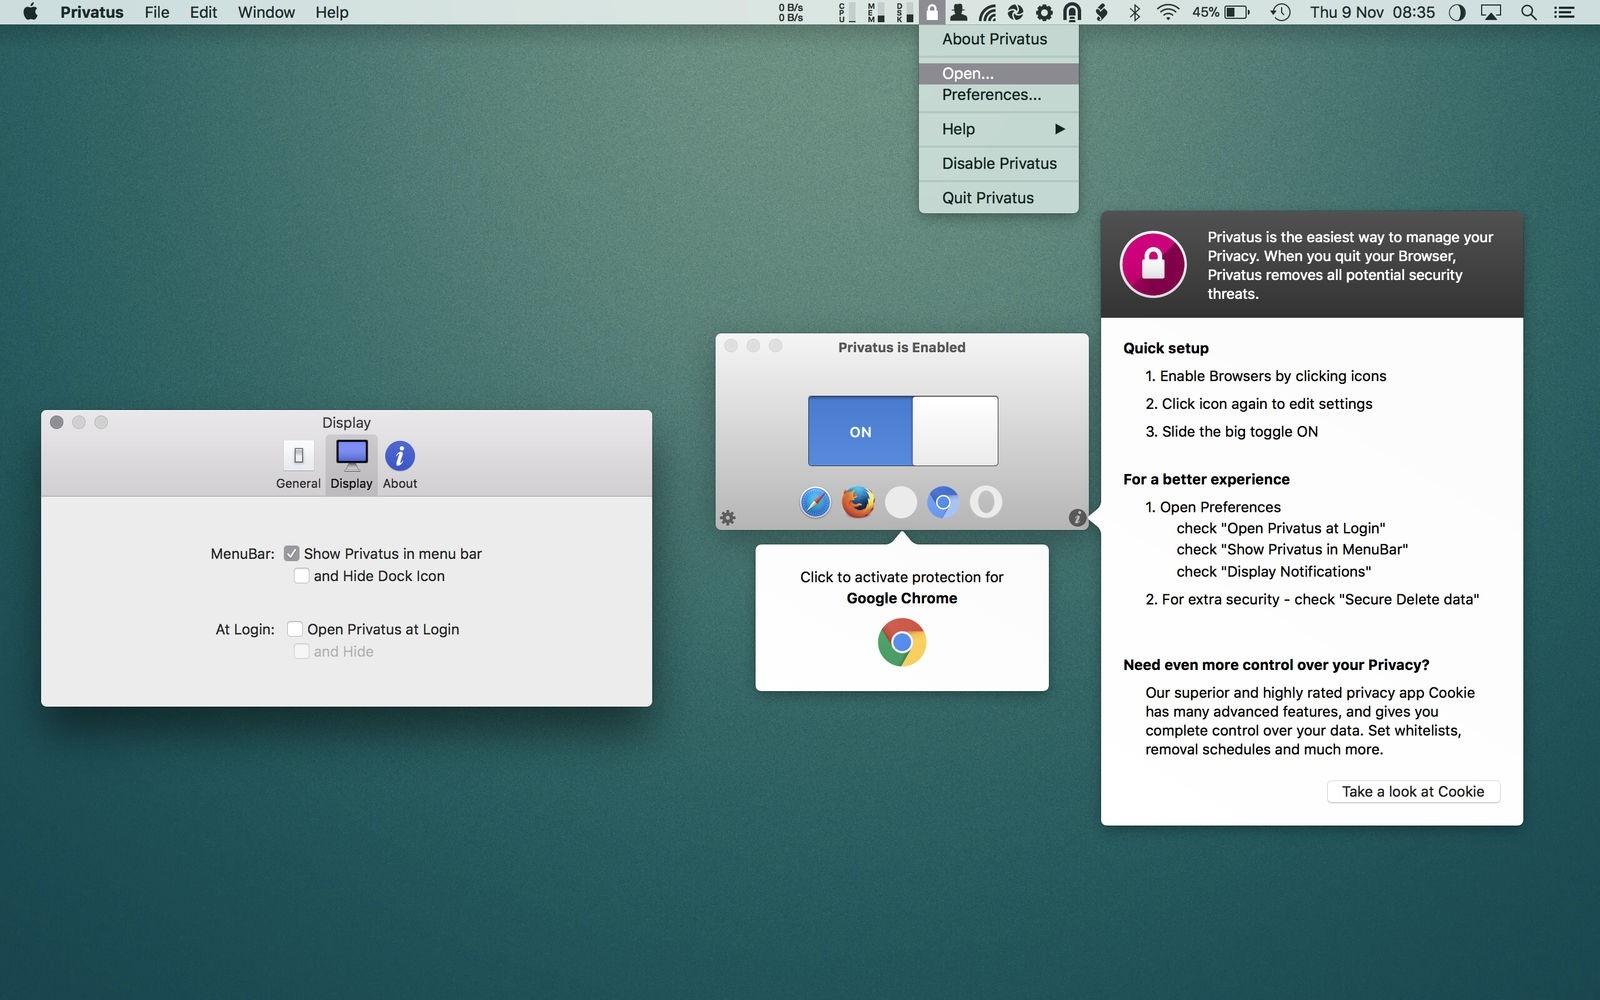 Privatus For Mac v6.2.5 自动清理网页缓存工具-马克喵